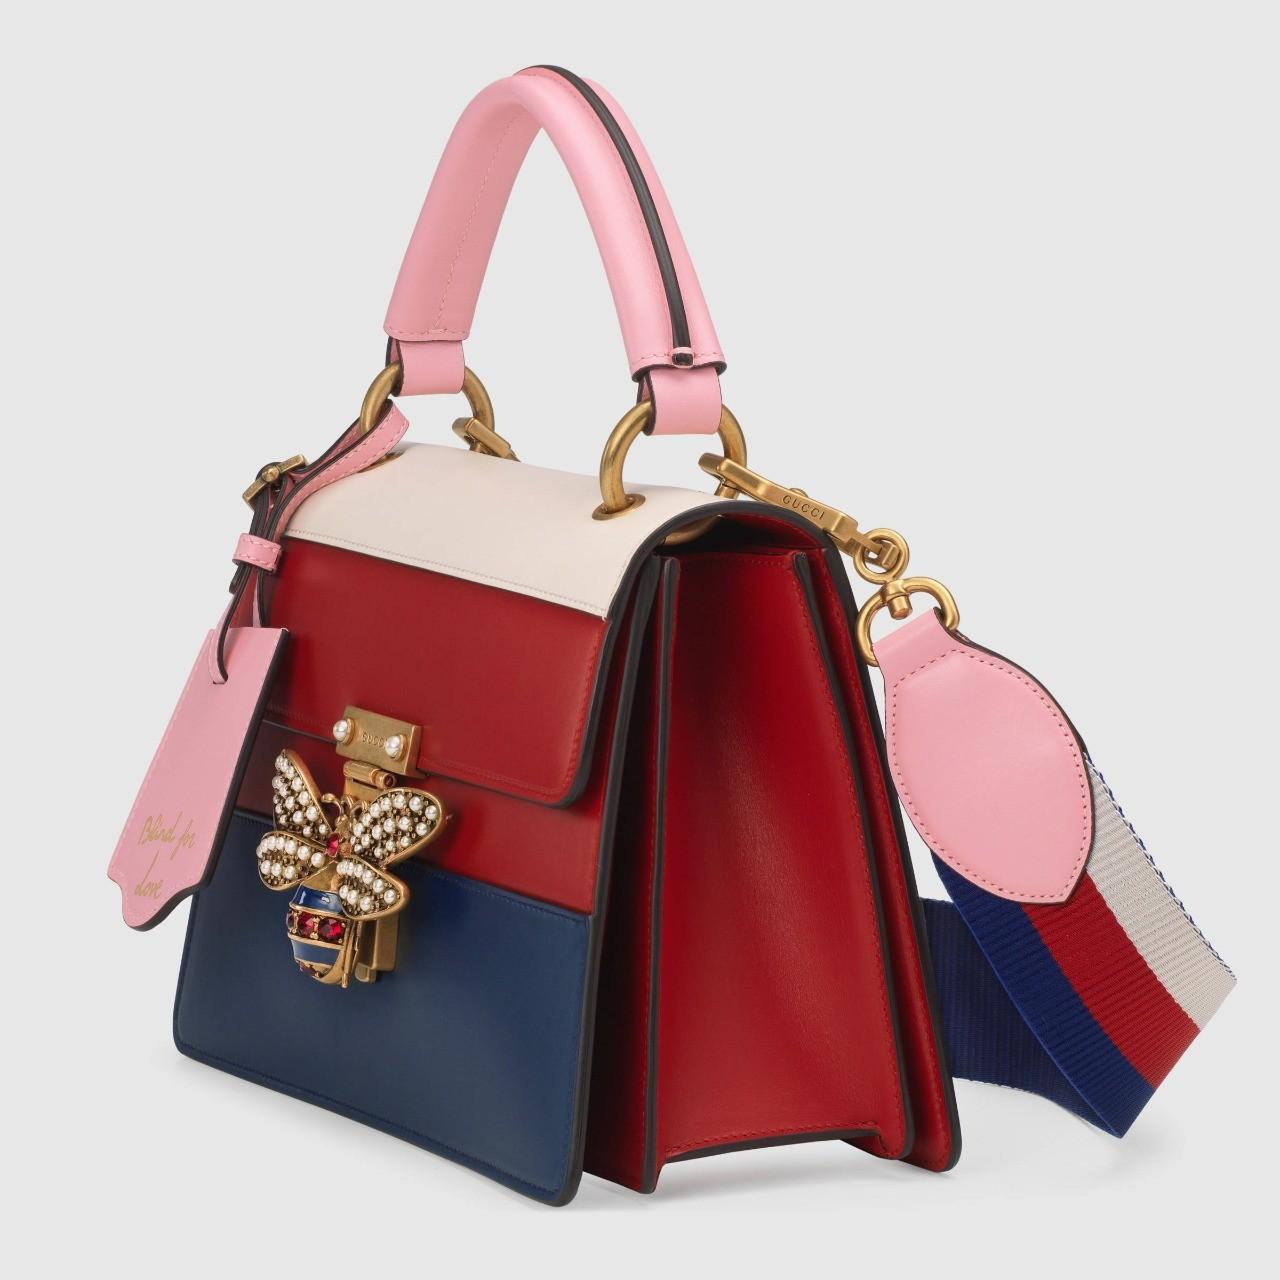 Bolsa Gucci Queen Margareth